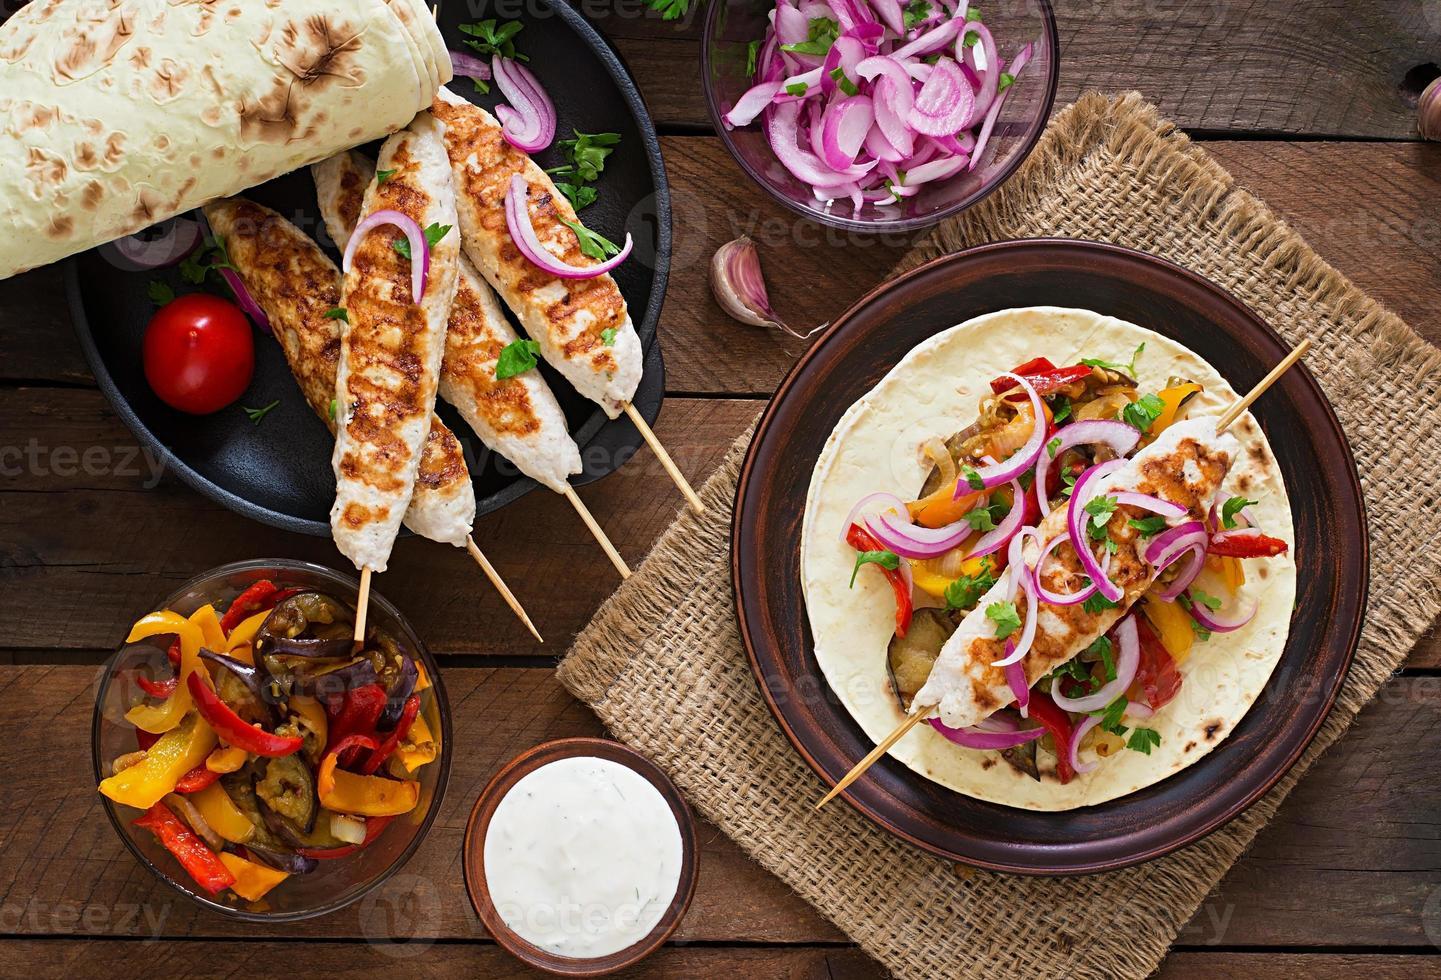 kip kebab met gegrilde groenten en tortilla wrap. foto